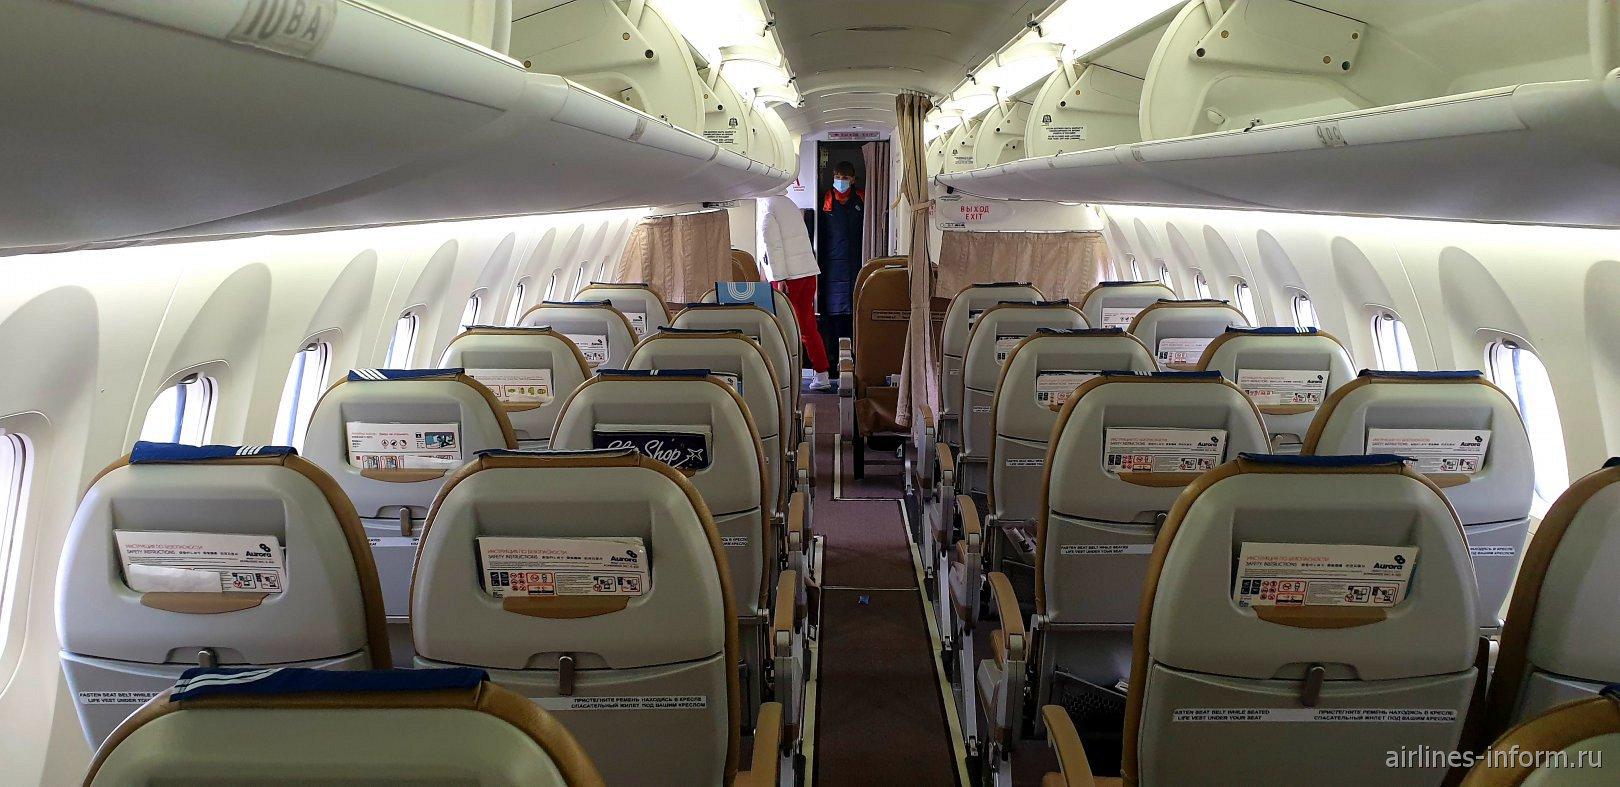 Пассажирский салон самолета Bombardier Dash 8 Q400 авиакомпании